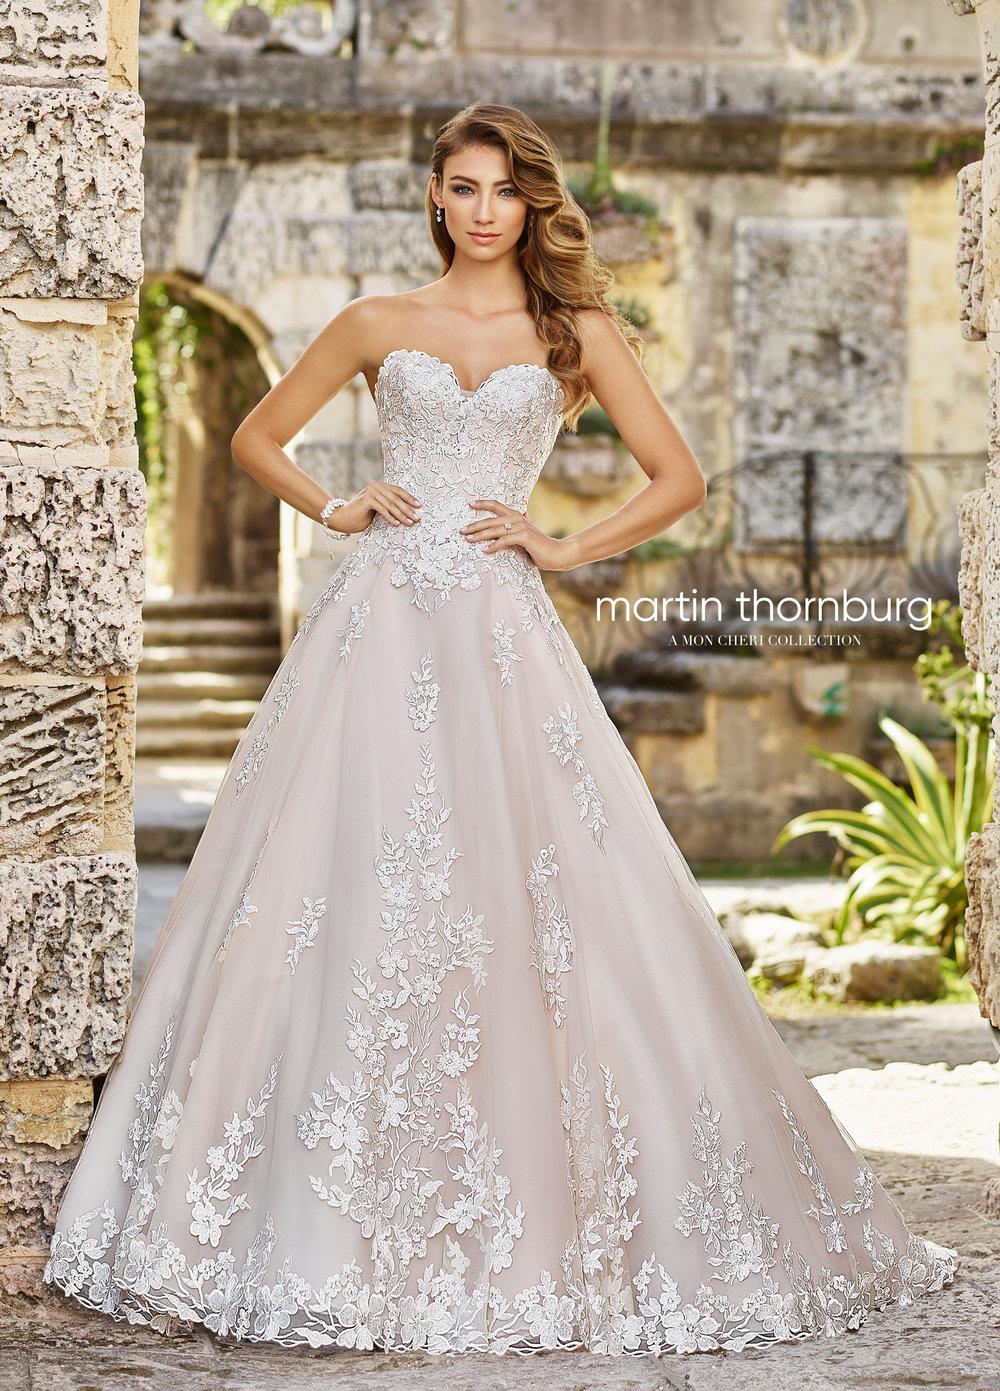 strapless-sweetheart-neckline-dress-218209-A.jpg